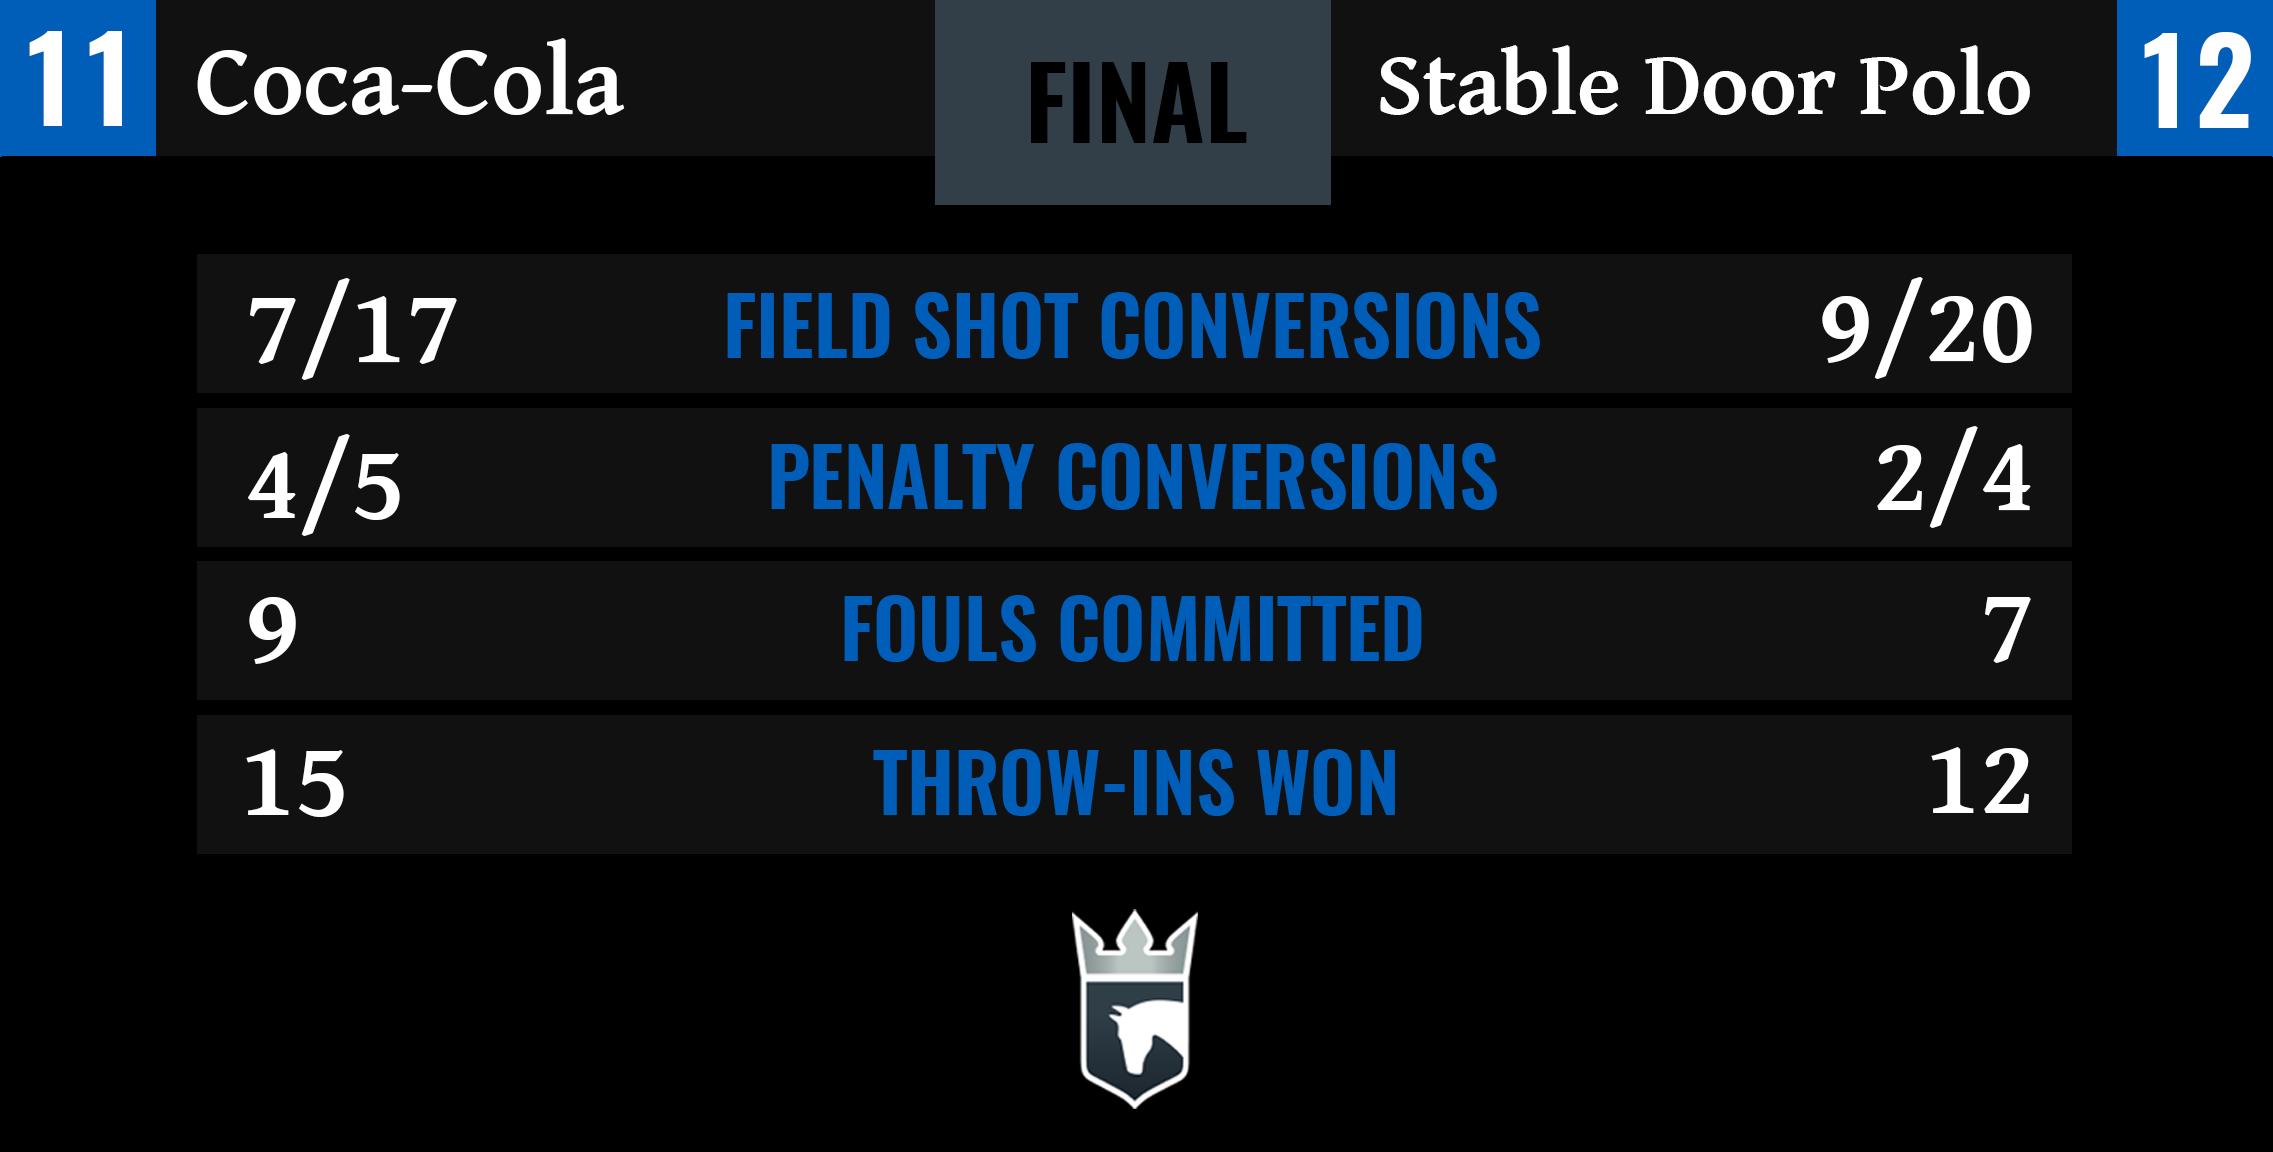 Coca-Cola vs Stable Door Polo Final Stats